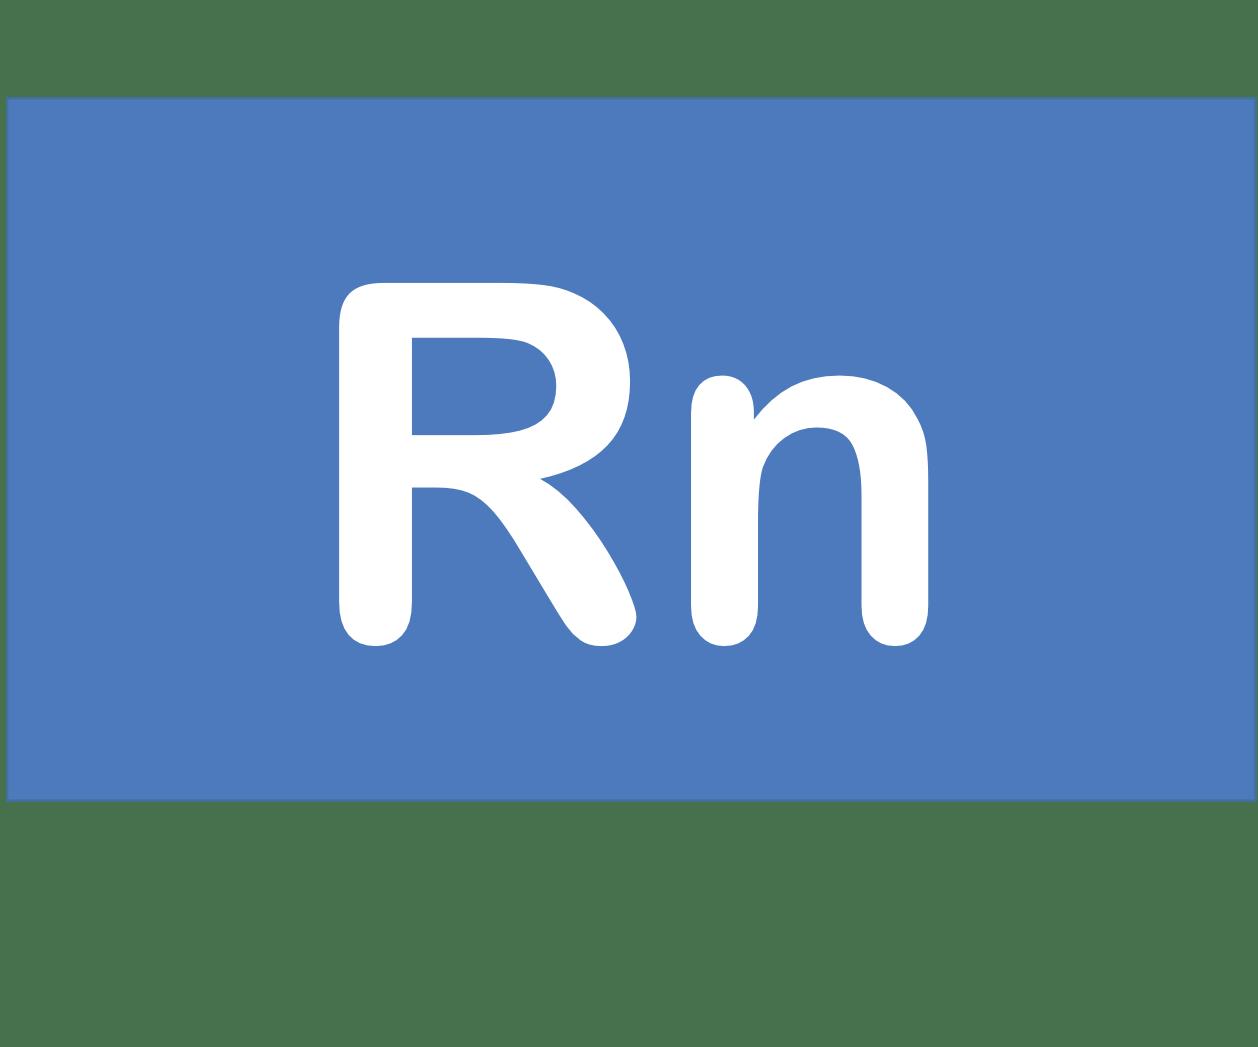 86 Rn ラドン Radon 元素 記号 周期表 化学 原子